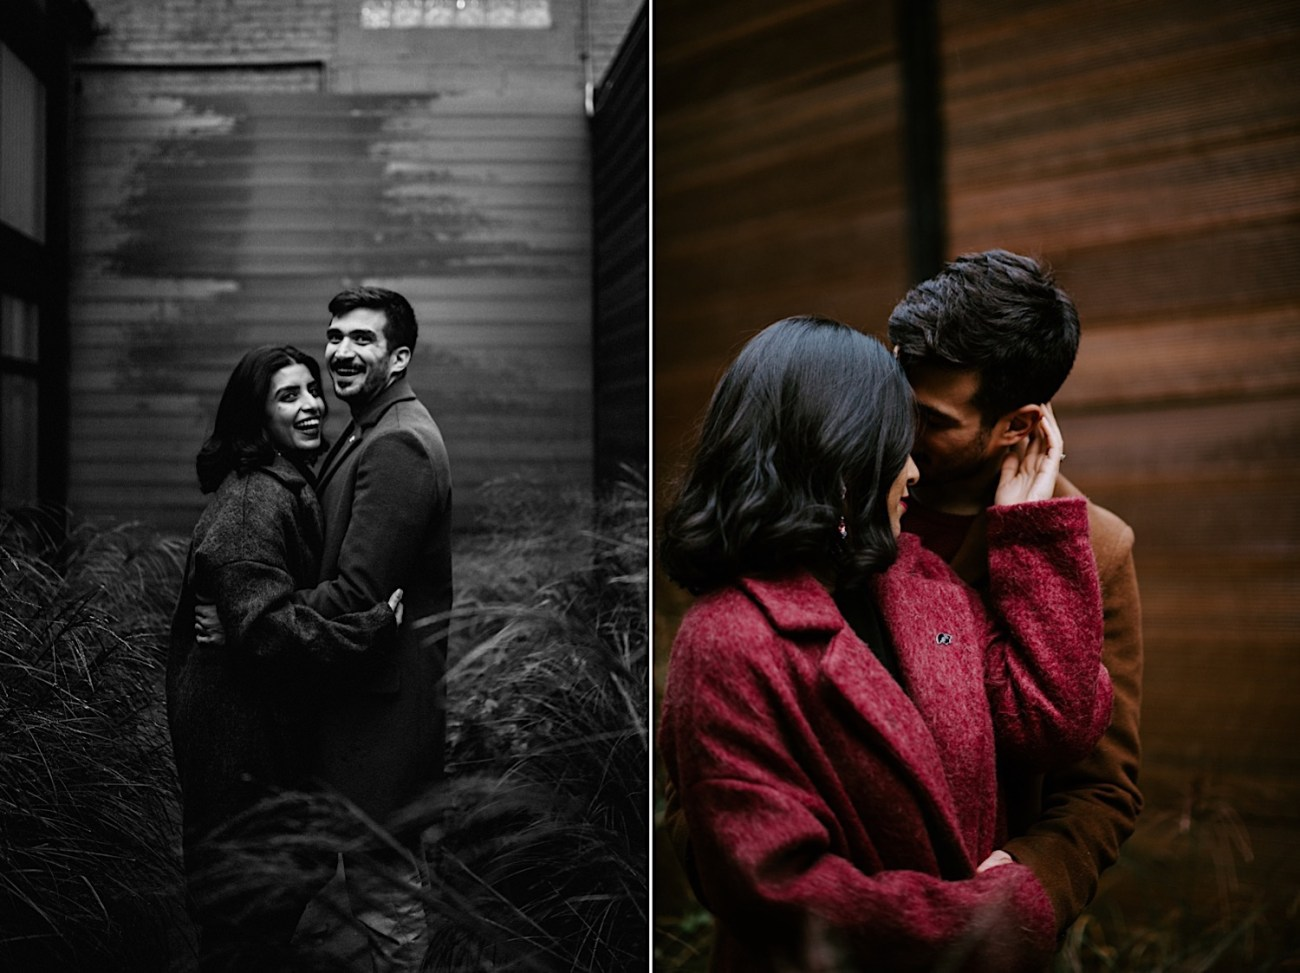 Brooklyn Wedding Photographer New York Wedding Photographer Anais Possamai Photographer 22